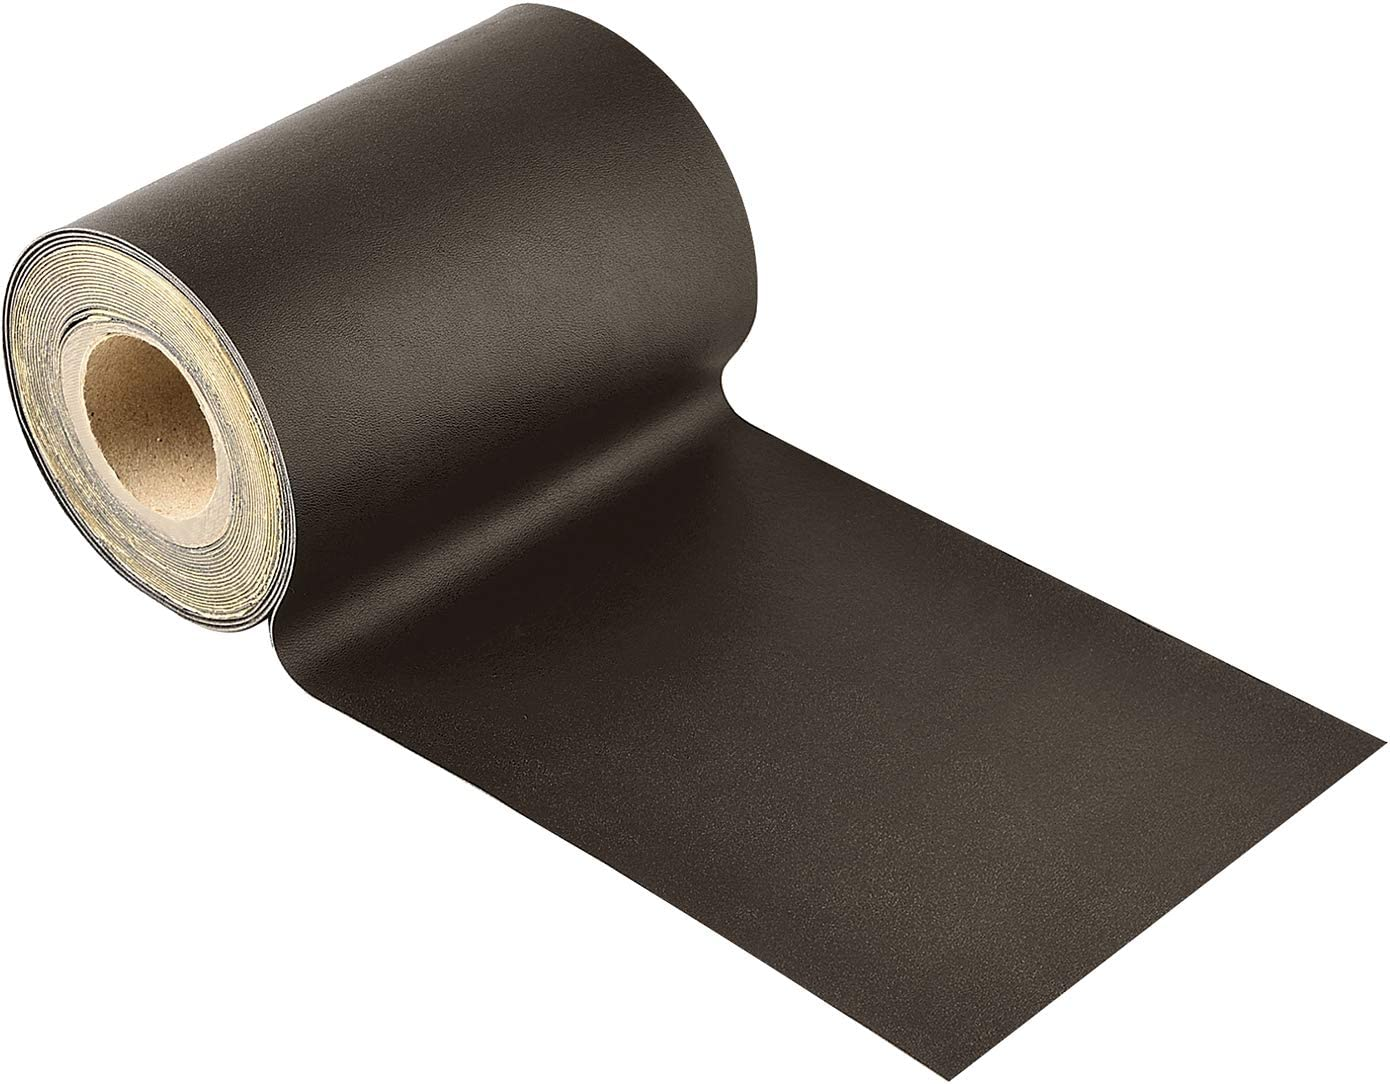 Leather Repair Tape, Self-Adhesive Leather Repair Patch for Sofas, Car Seats, Handbags,Furniture, Drivers Seat,Dark Brown, 5 X 180 Inch